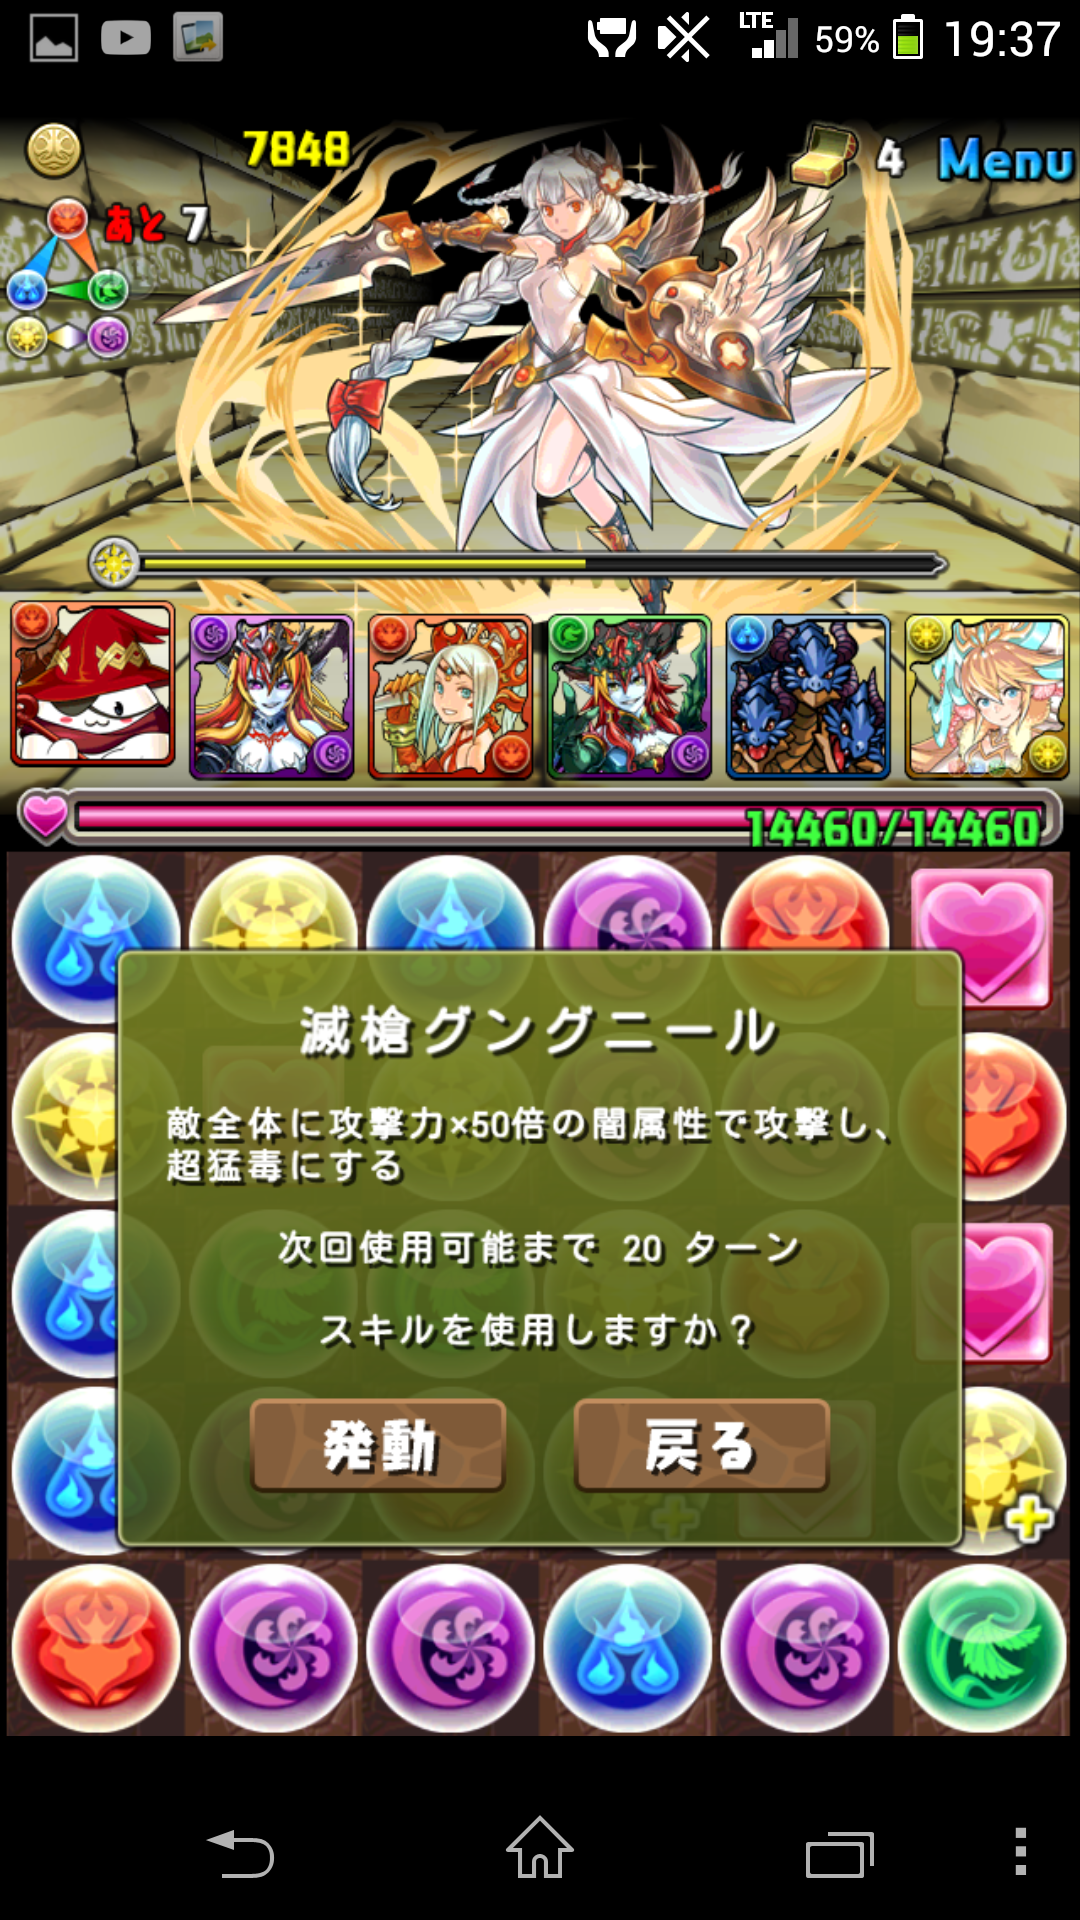 Screenshot_2014-05-17-19-37-43.png